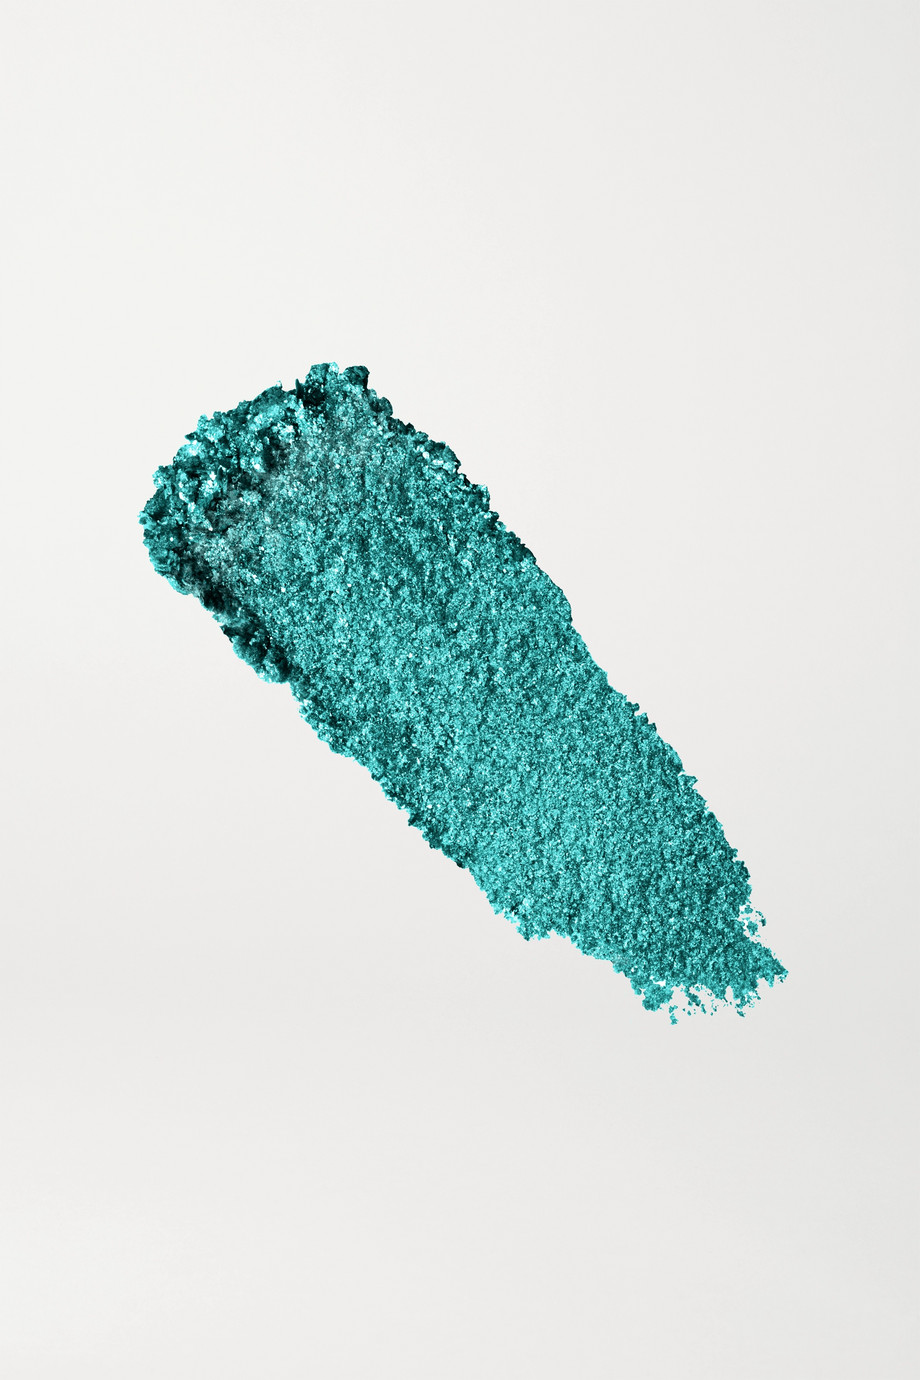 NARS Pigment-poudre à paupières Powerchrome, Islamorada